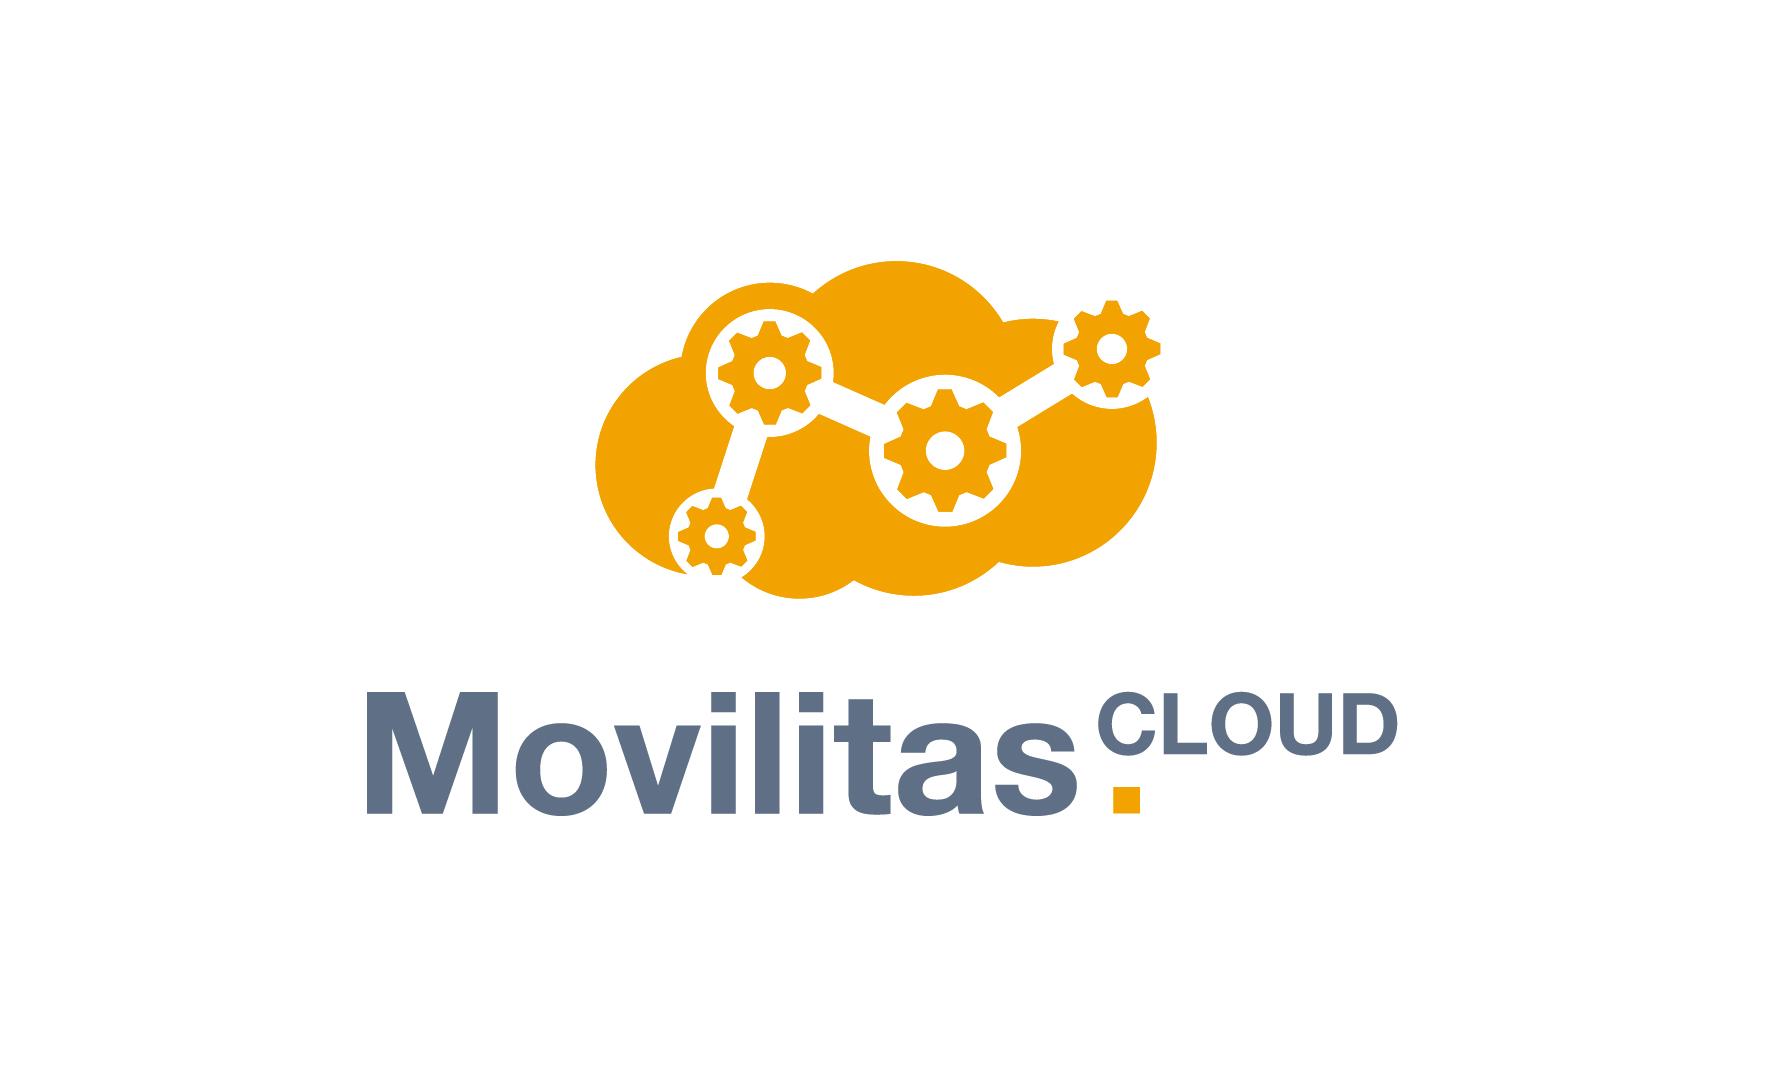 mov-logo-movilitascloud-01